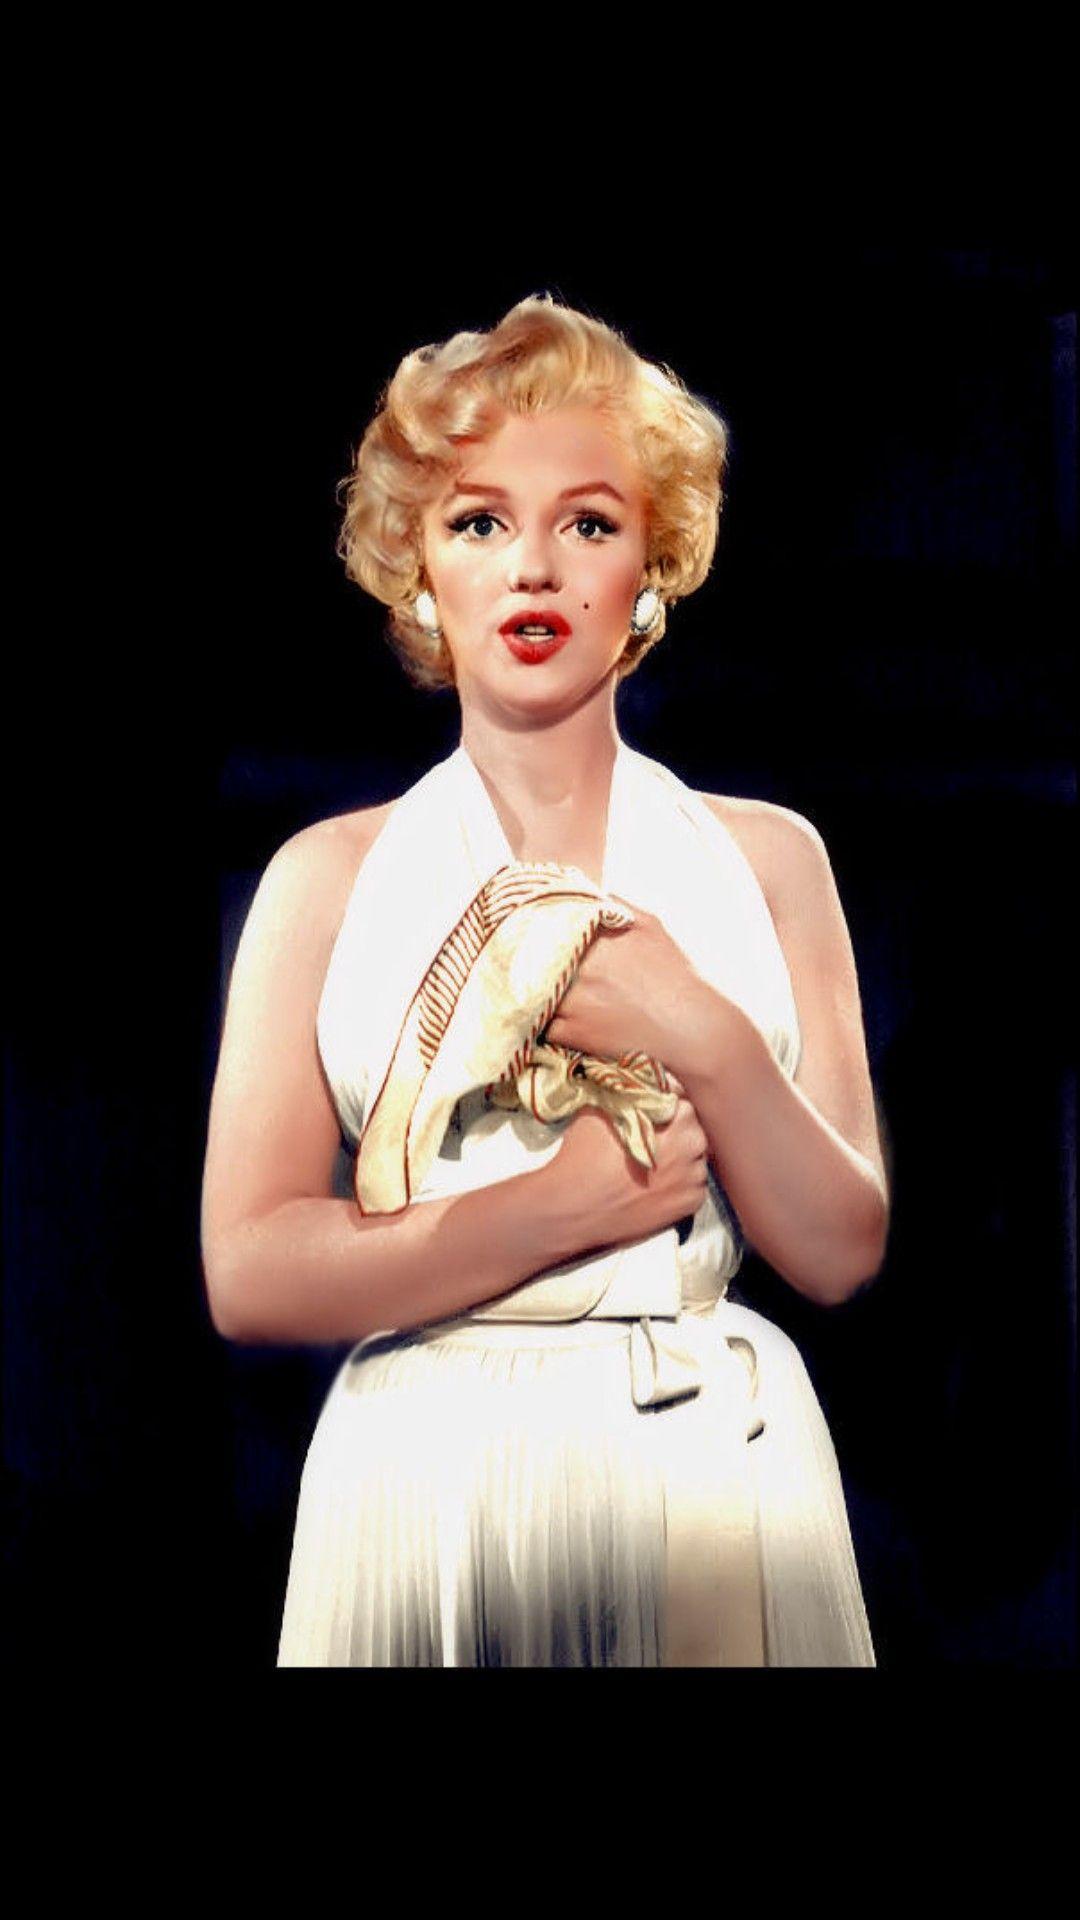 Pin De Chrystian Em Classicos Cinema Tv Fotos Marilyn Monroe